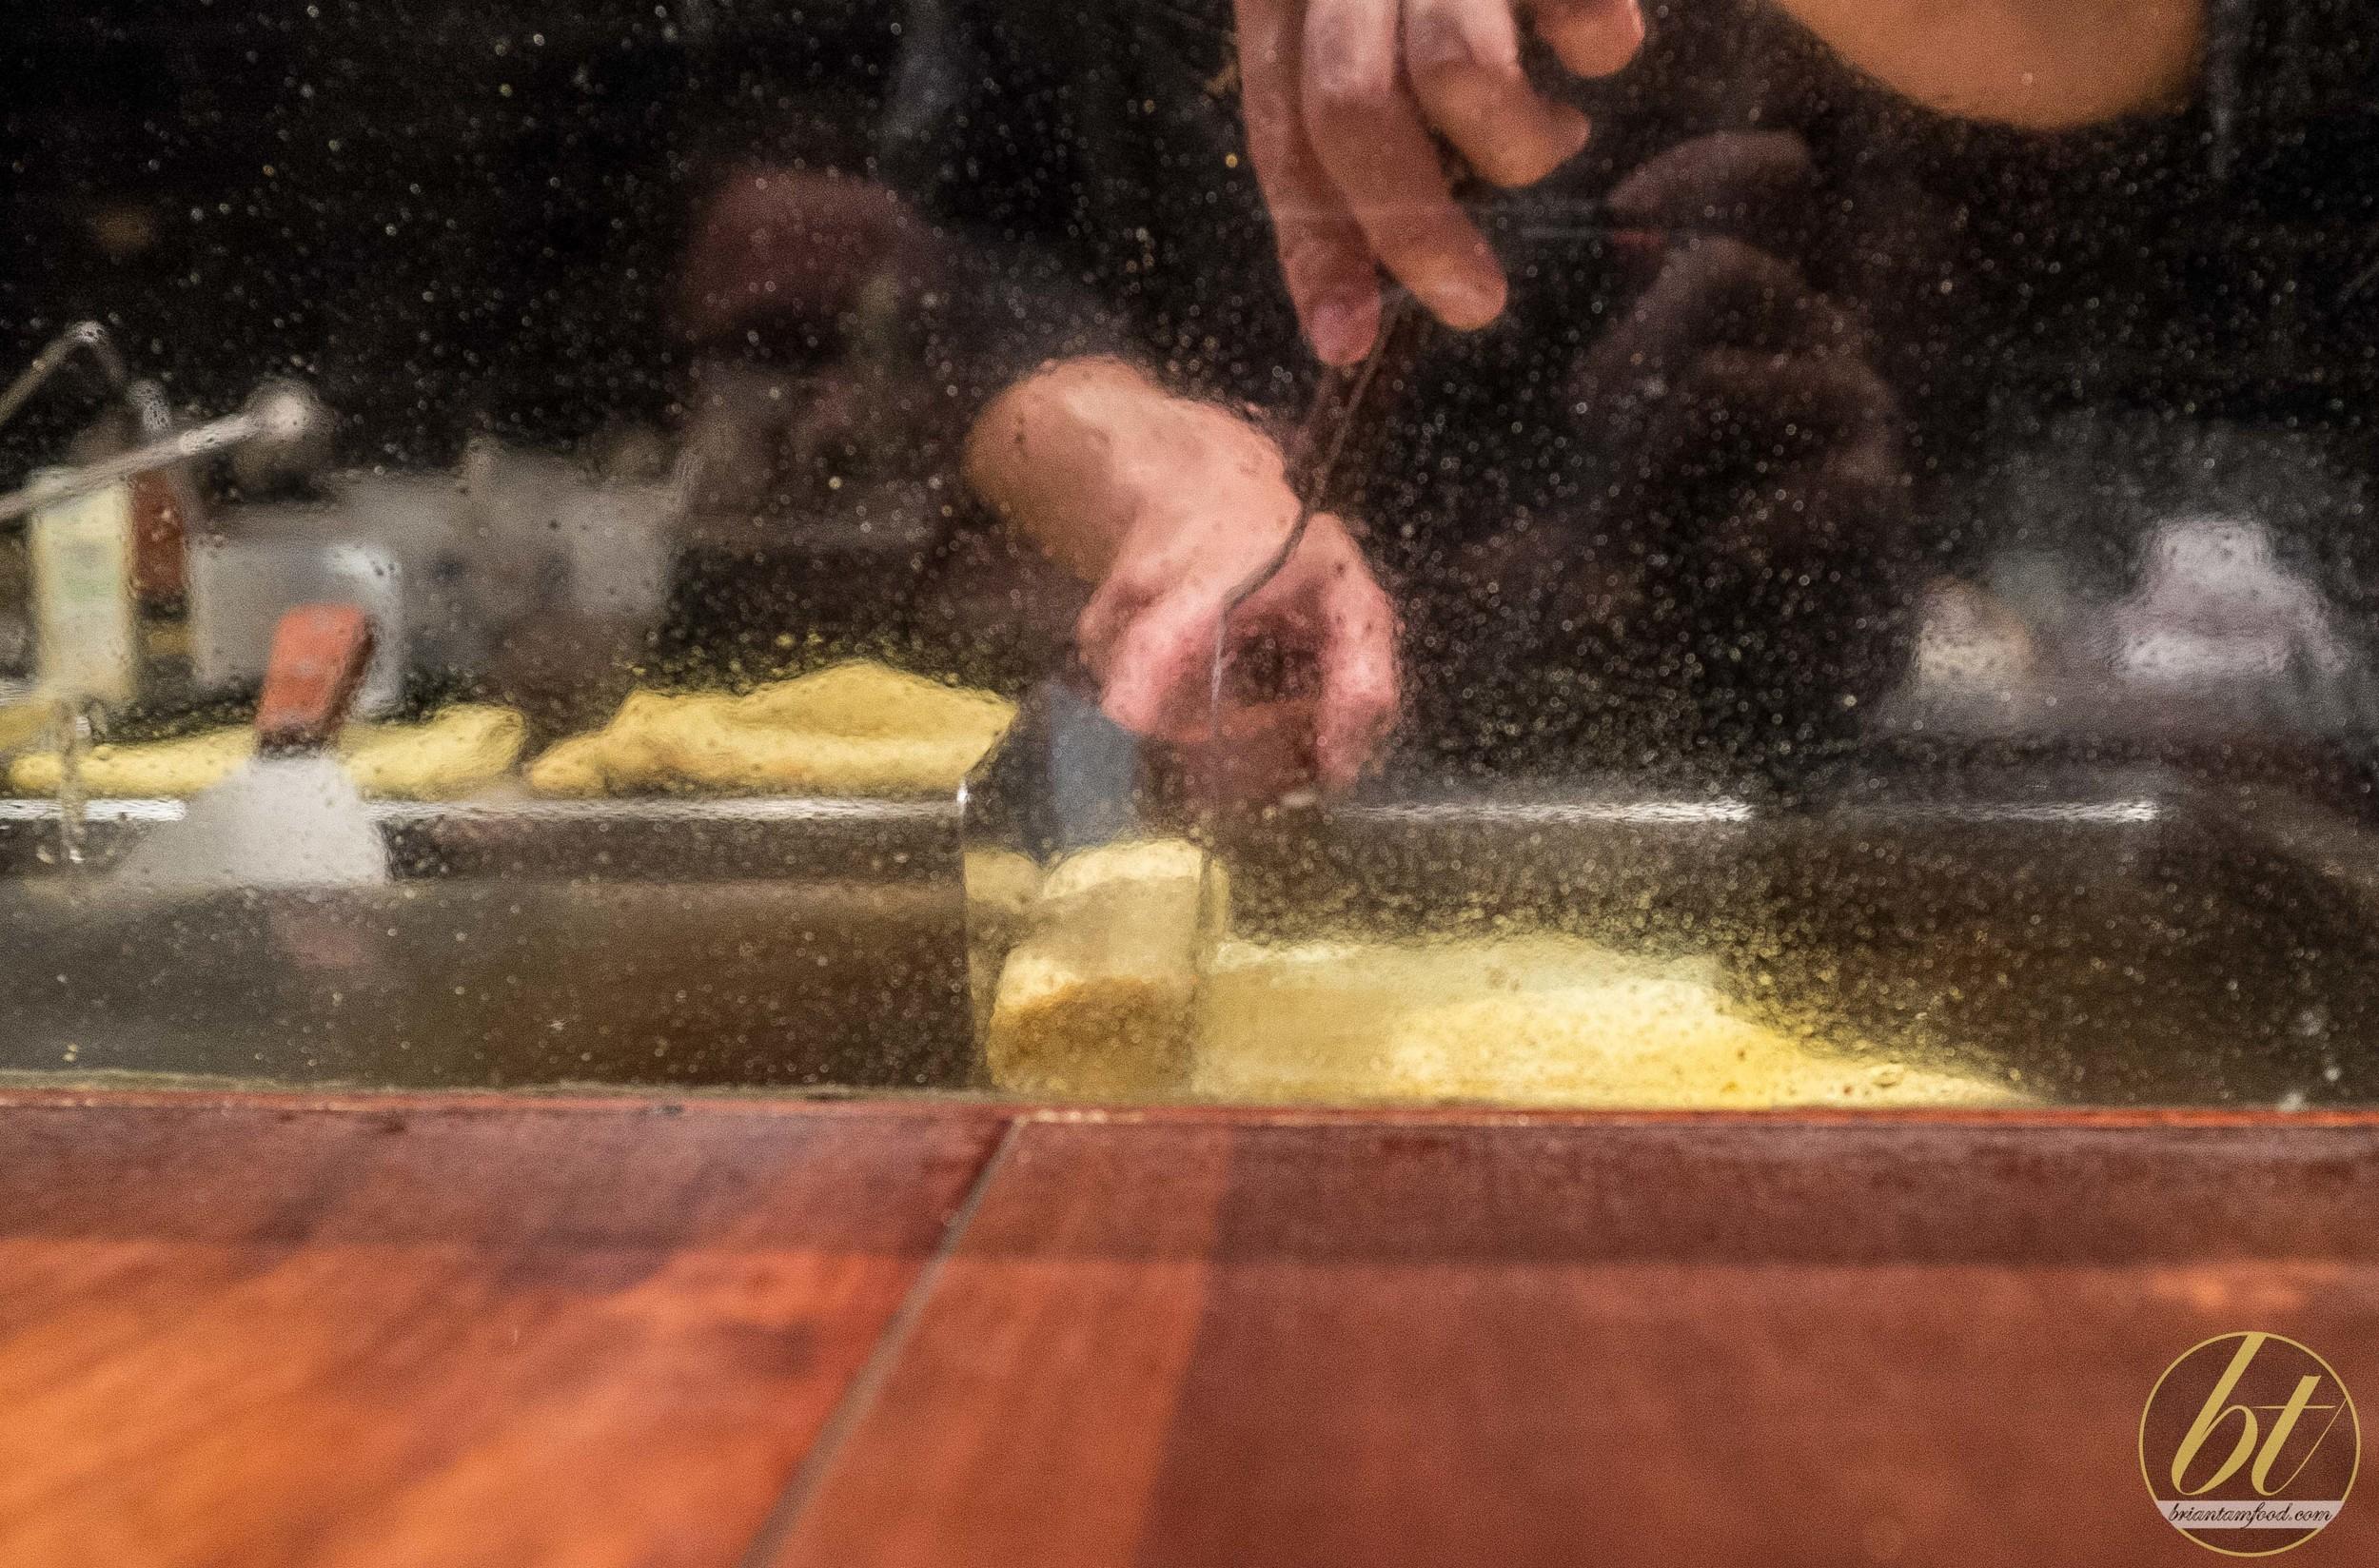 Tamagoyaki being prepared on the teppan